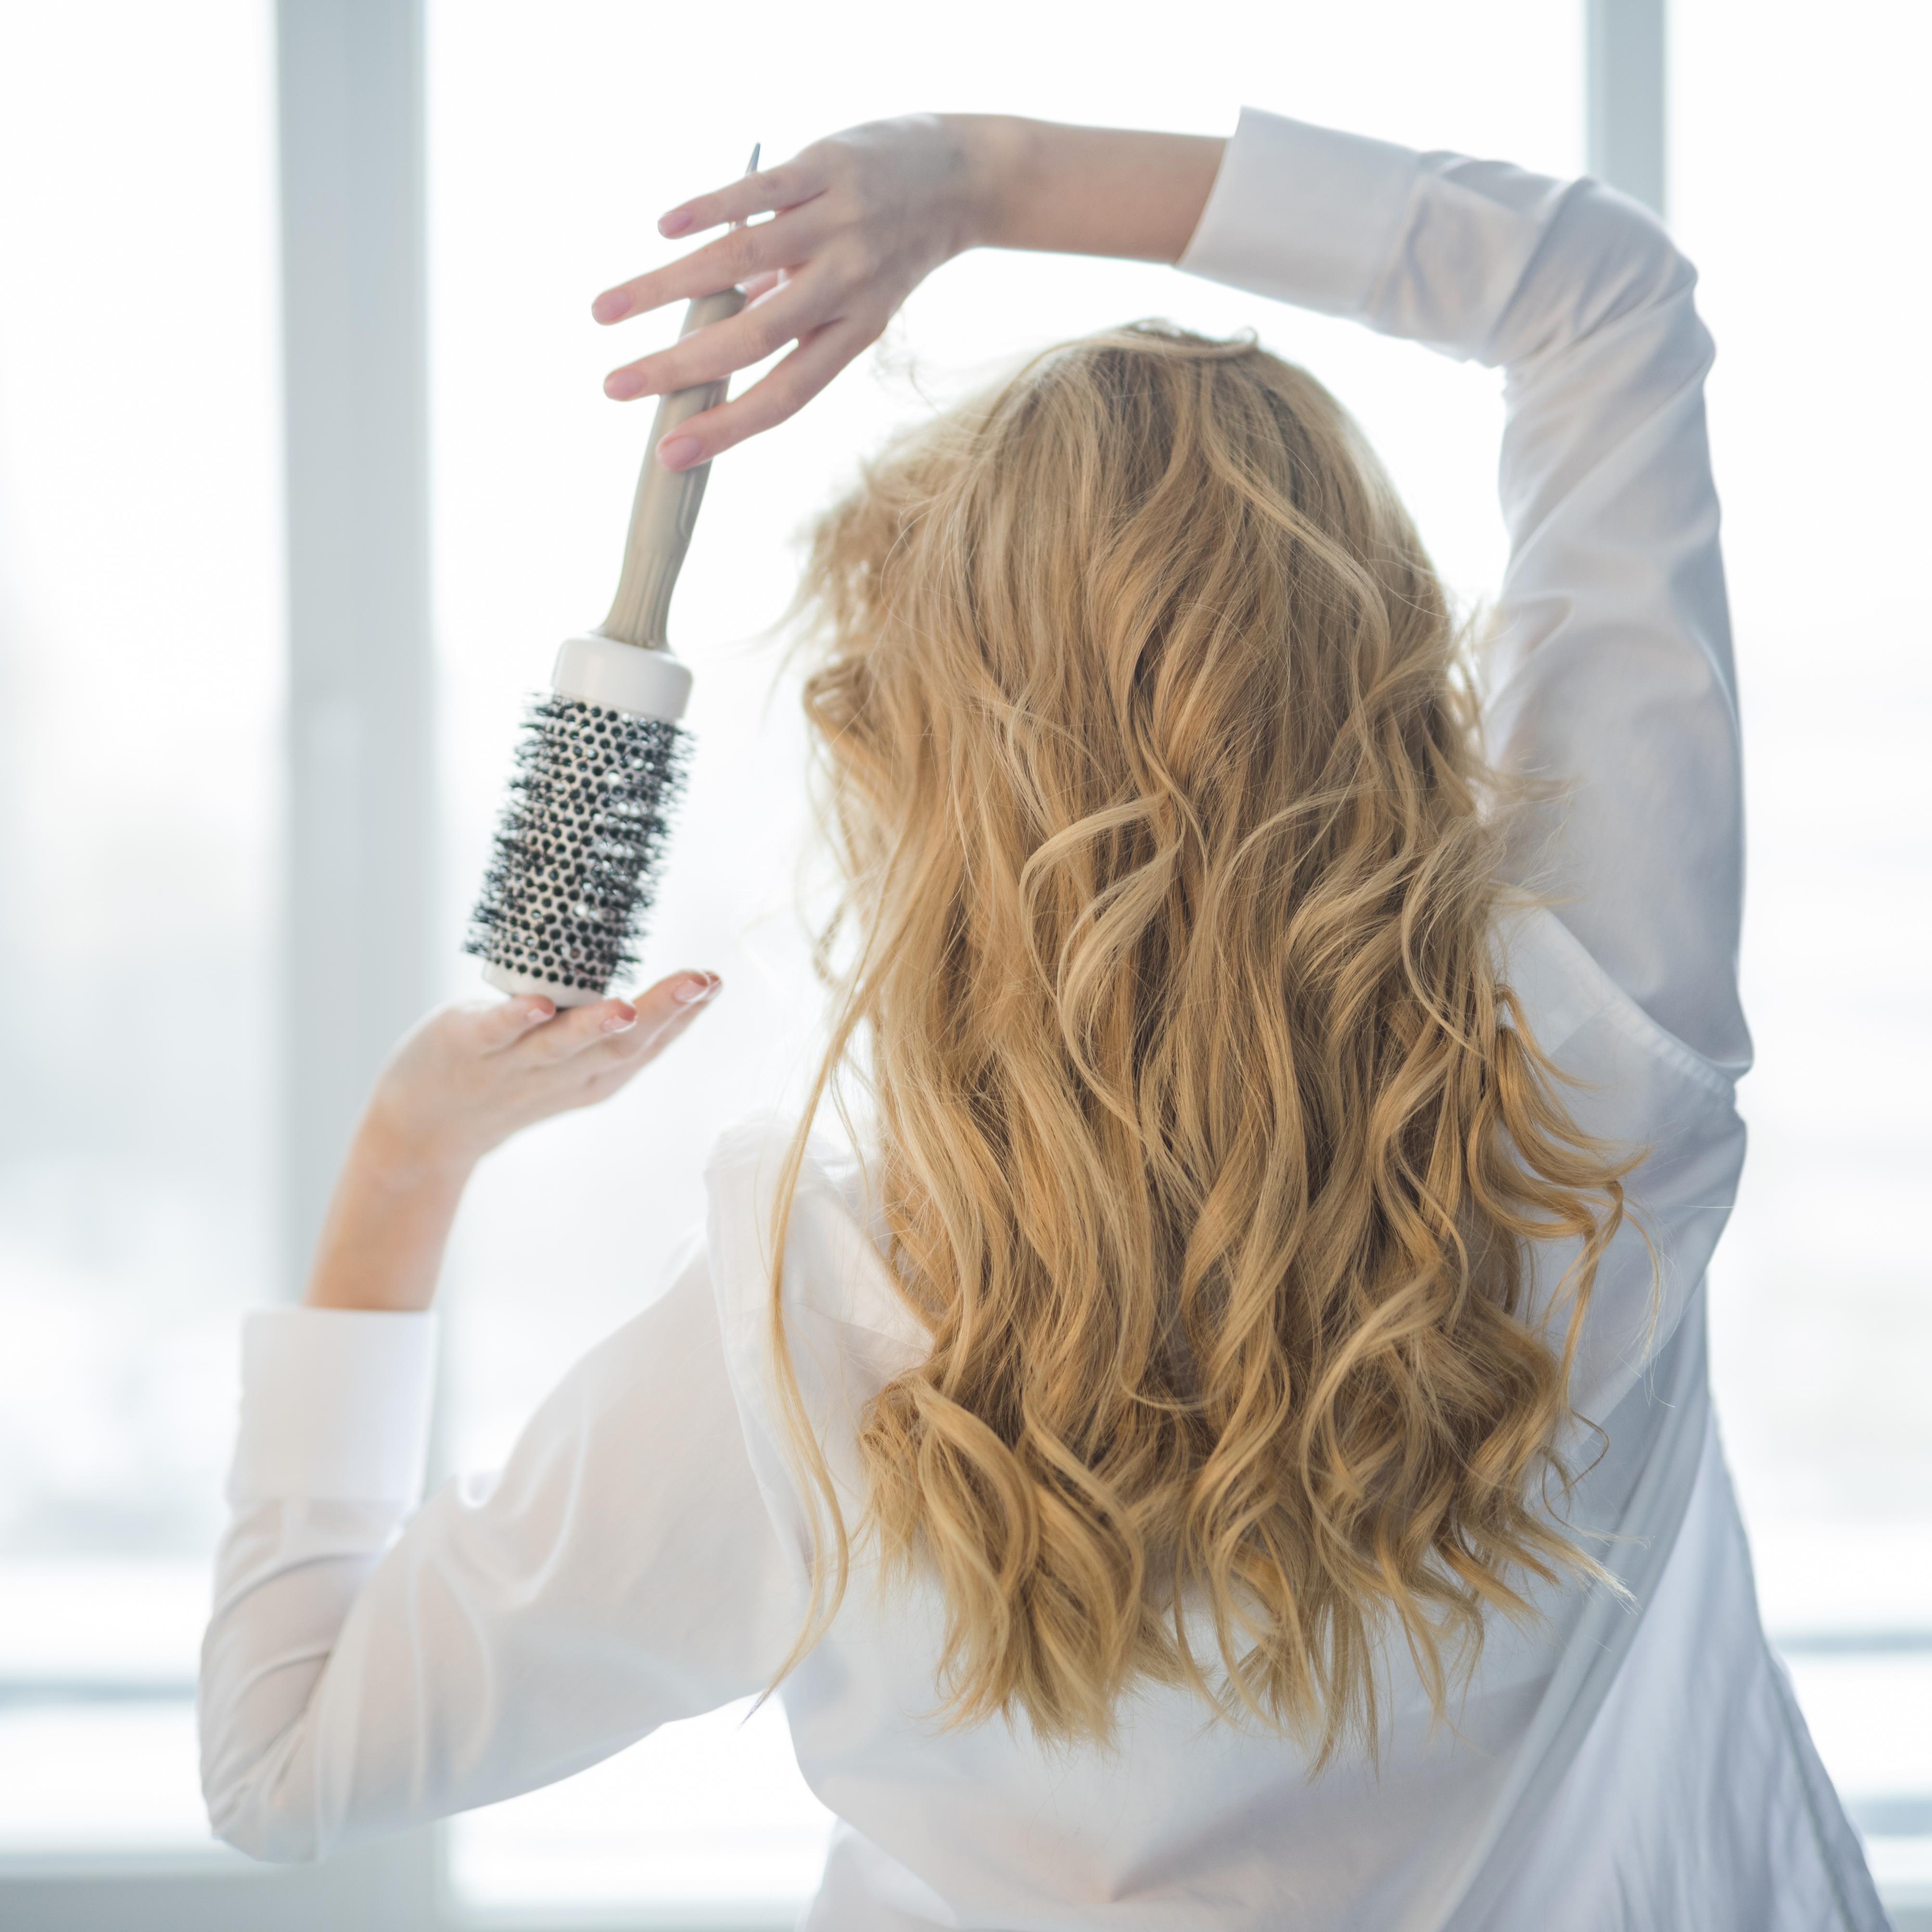 Средства wella для ухода за волосами